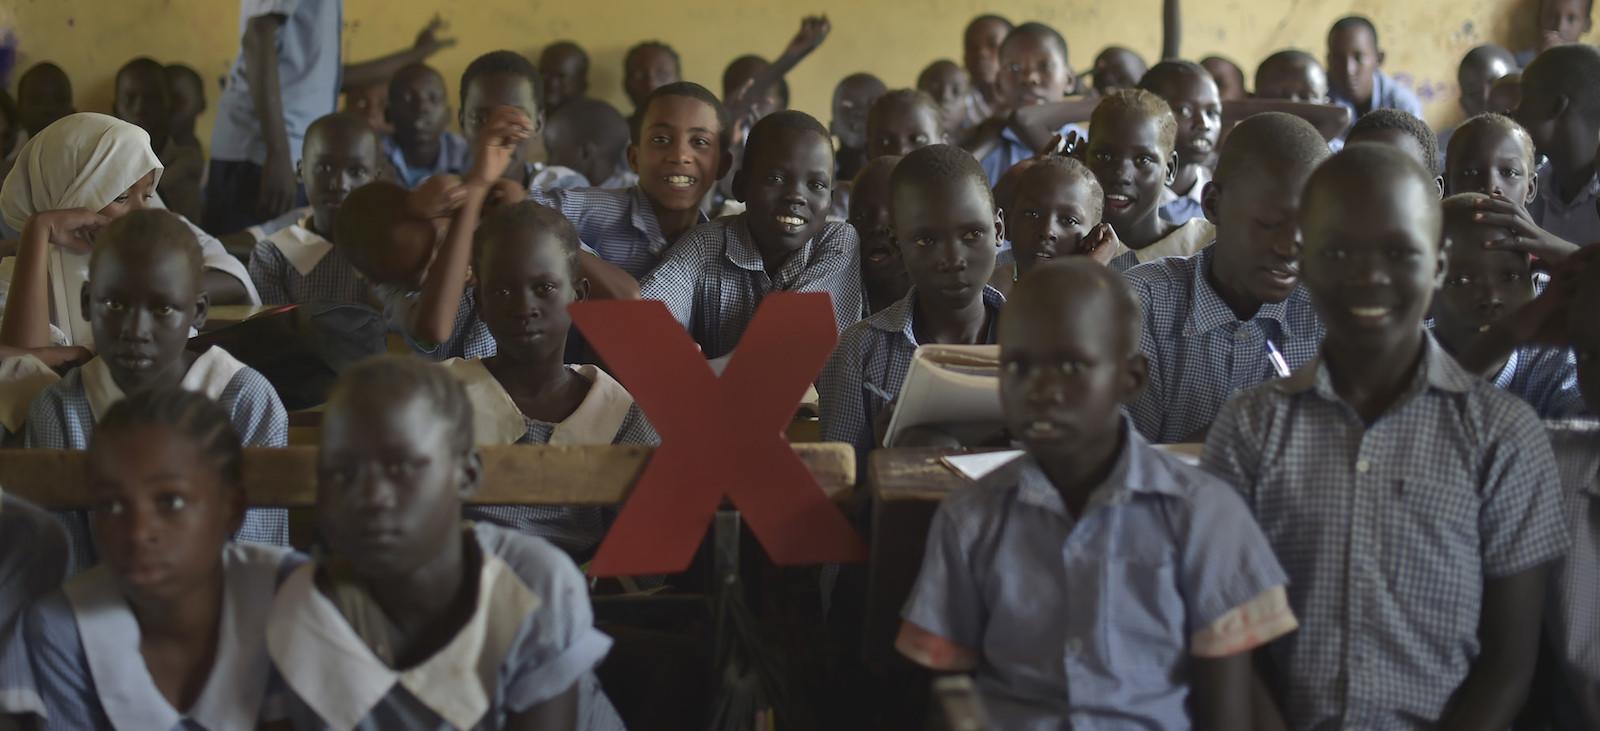 Refugees from Kakuma pose with the TedX logo (Photo: TEDxKakumacamp/Flickr)